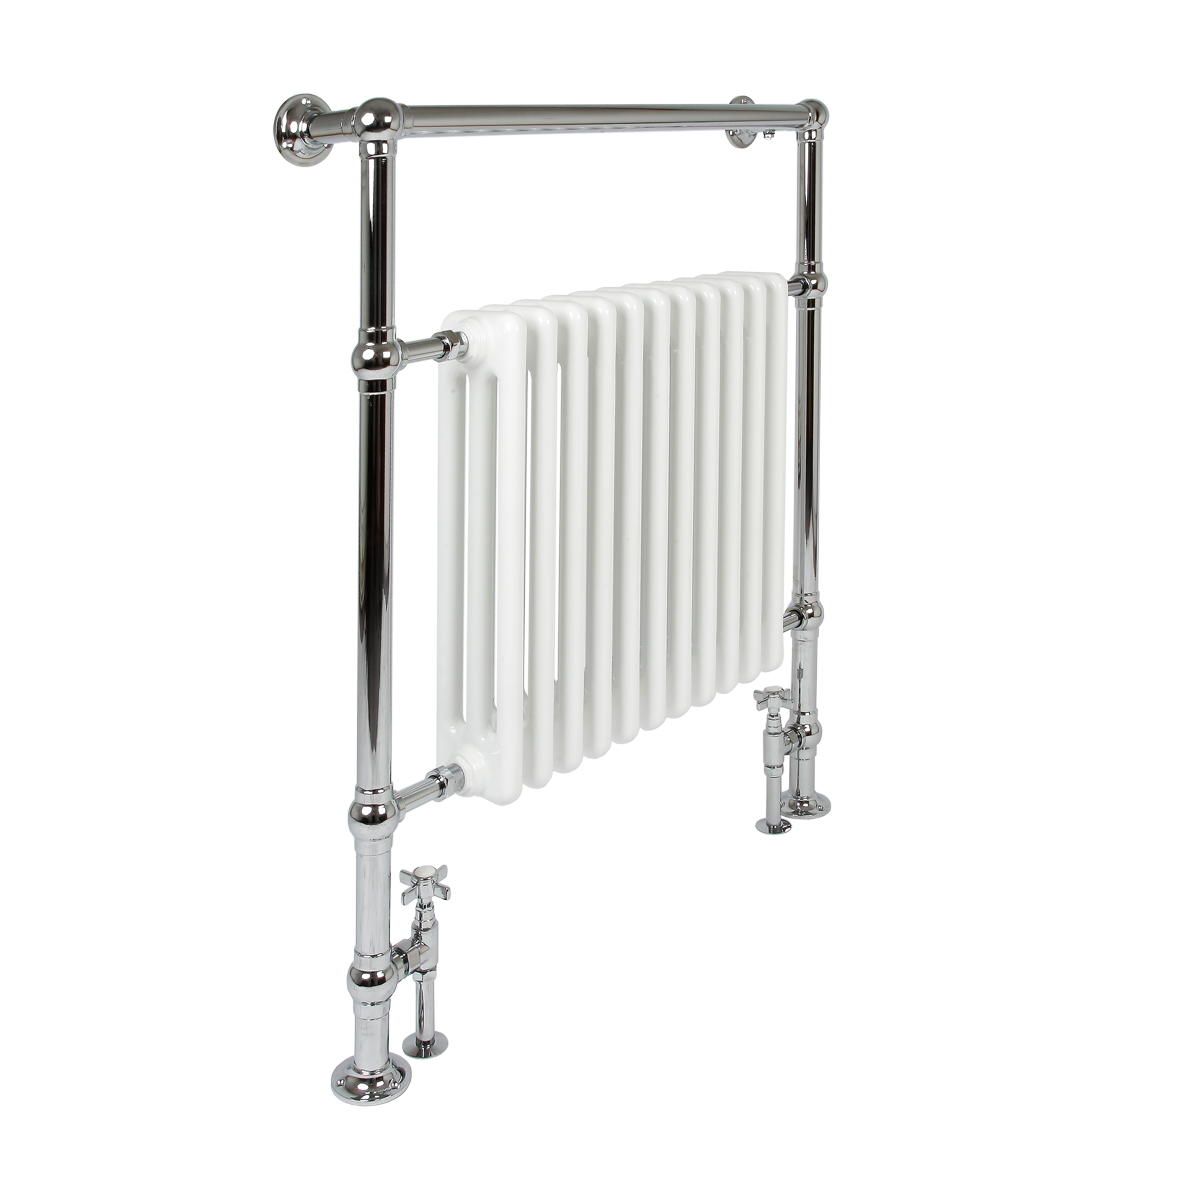 vivien towel rail radiator for sale period home style. Black Bedroom Furniture Sets. Home Design Ideas